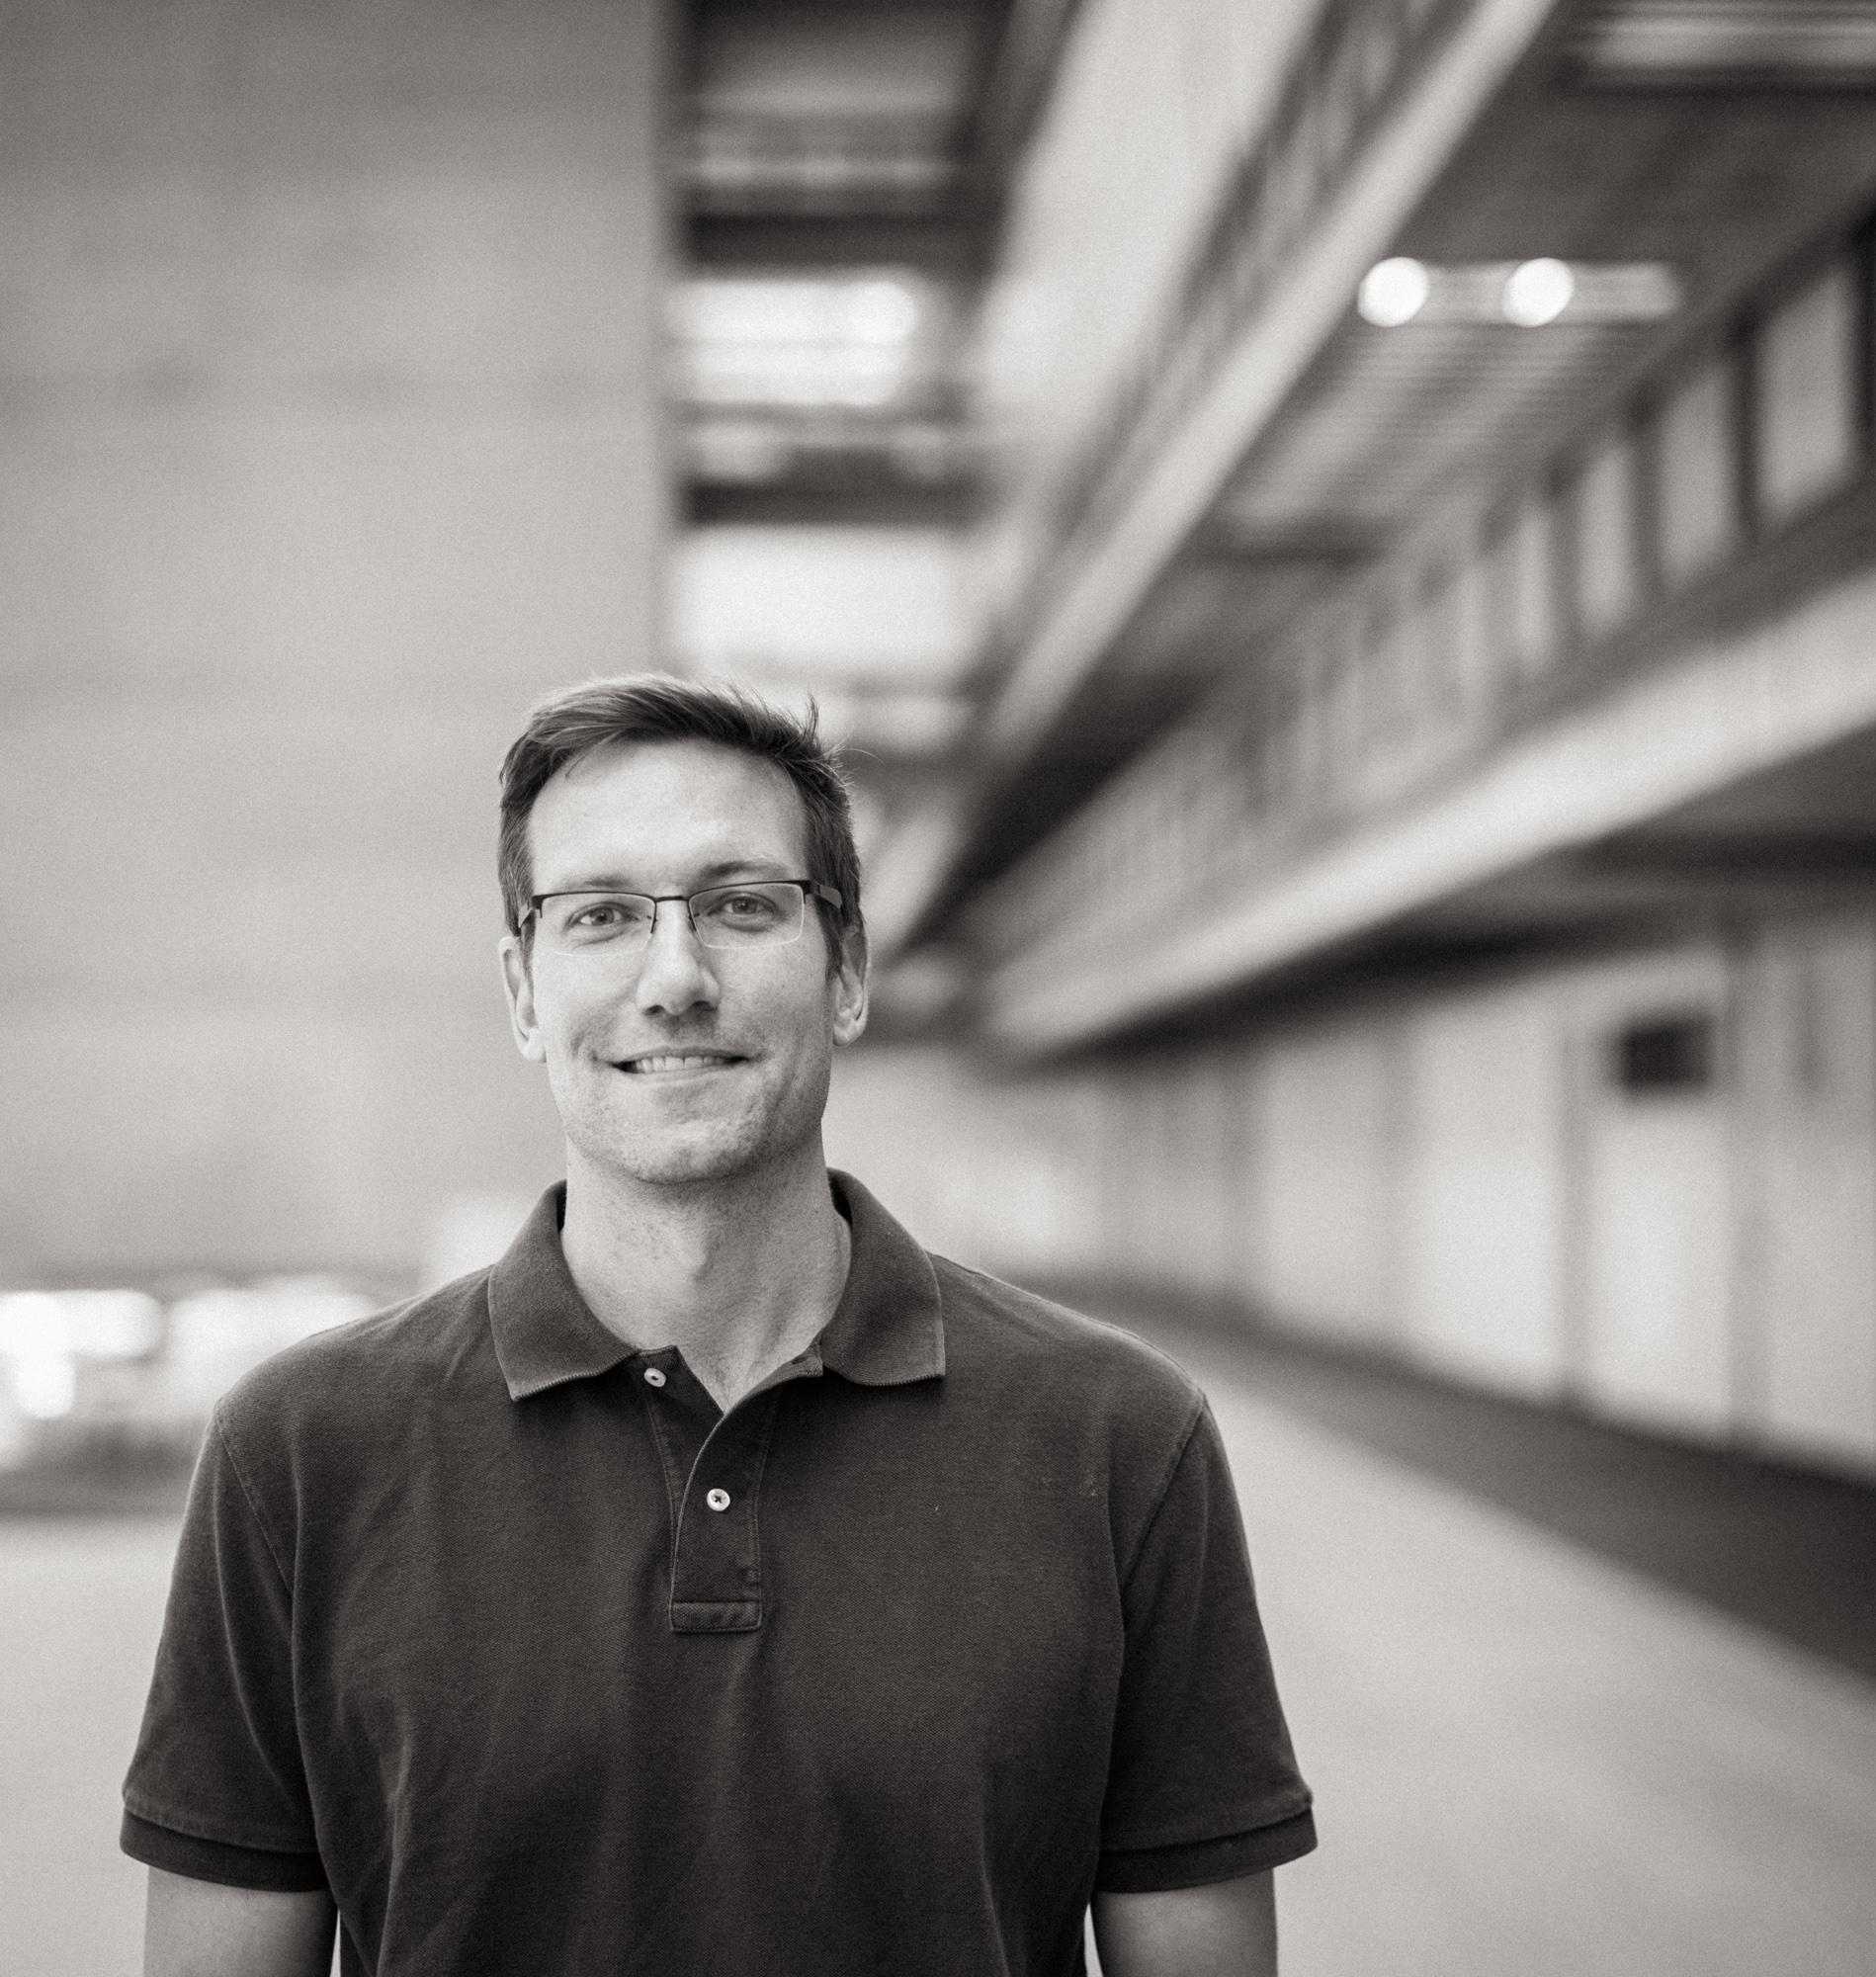 Kevin Field  AIA, LEED AP |Partner  kfield@nichollfielddesign.com